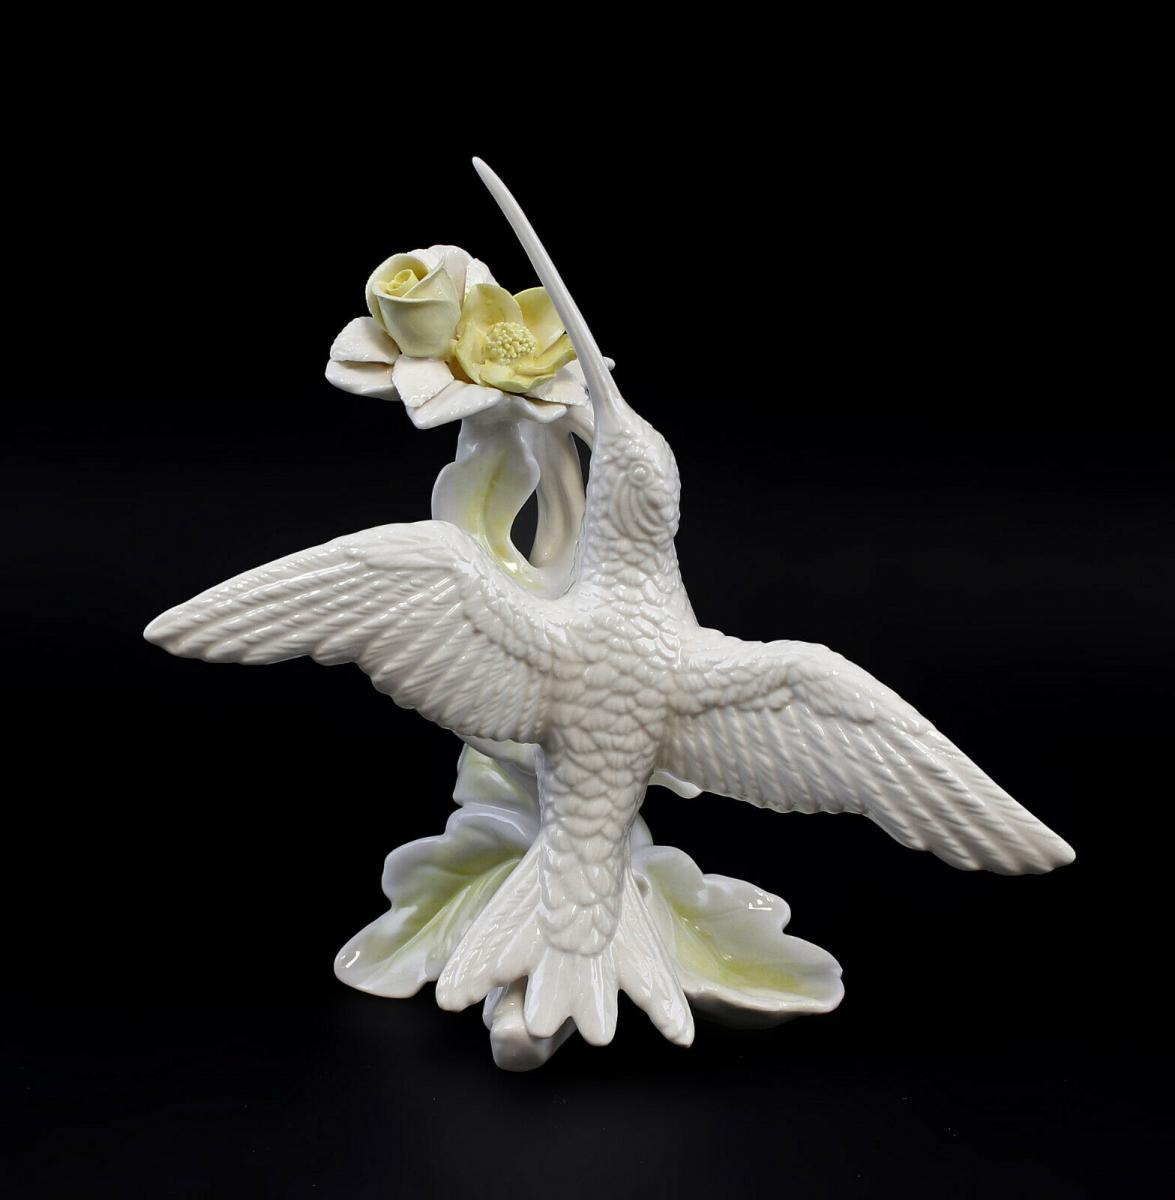 9959479 Porzellan Figur Kolibri weiß gelbe Blüte Vogel Ens 17x10x17cm